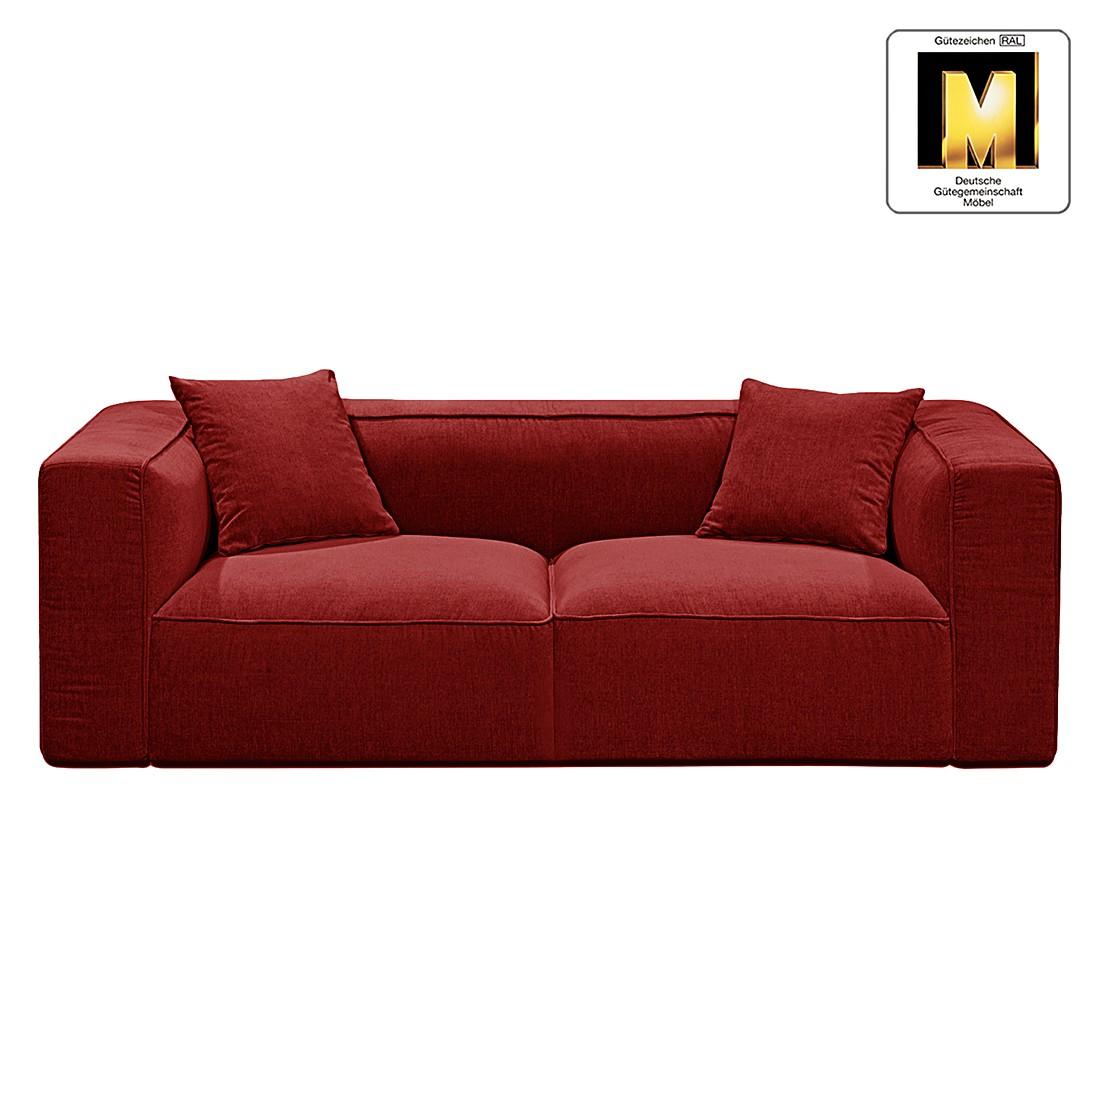 Sofa Casual Line VIII (3-Sitzer) – Velours Dunkelrot, Claas Claasen günstig kaufen